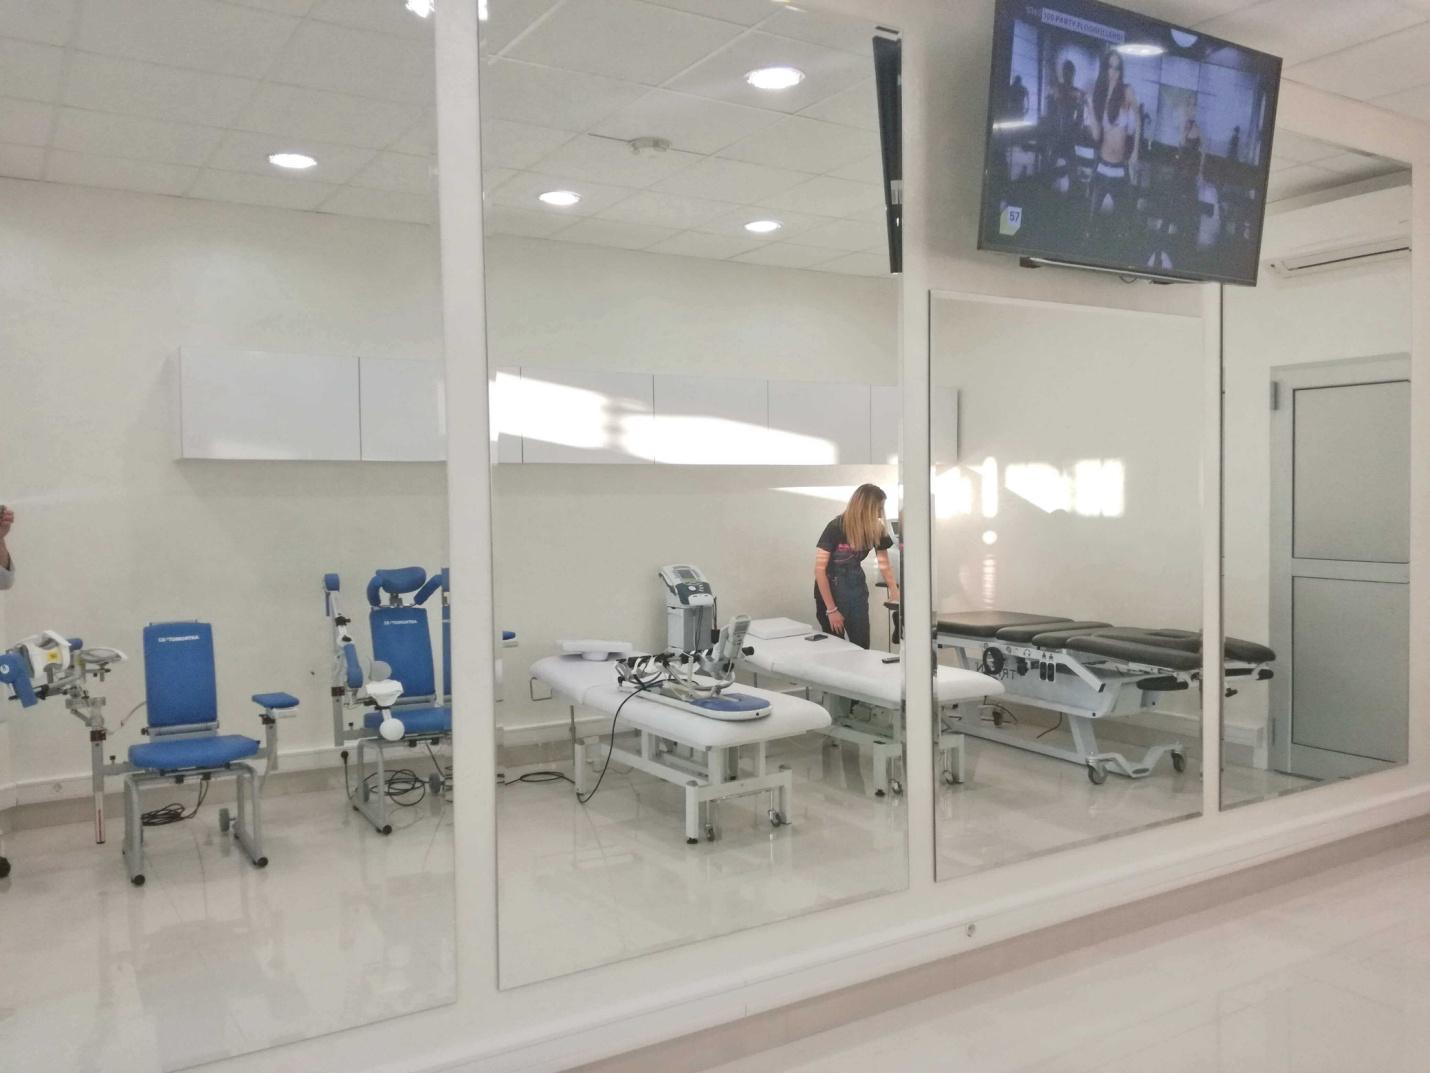 1554537625_09.fizikalna-medicina-i-rehabilitacija-bolesti-ramenog-zgloba-galerija.JPG